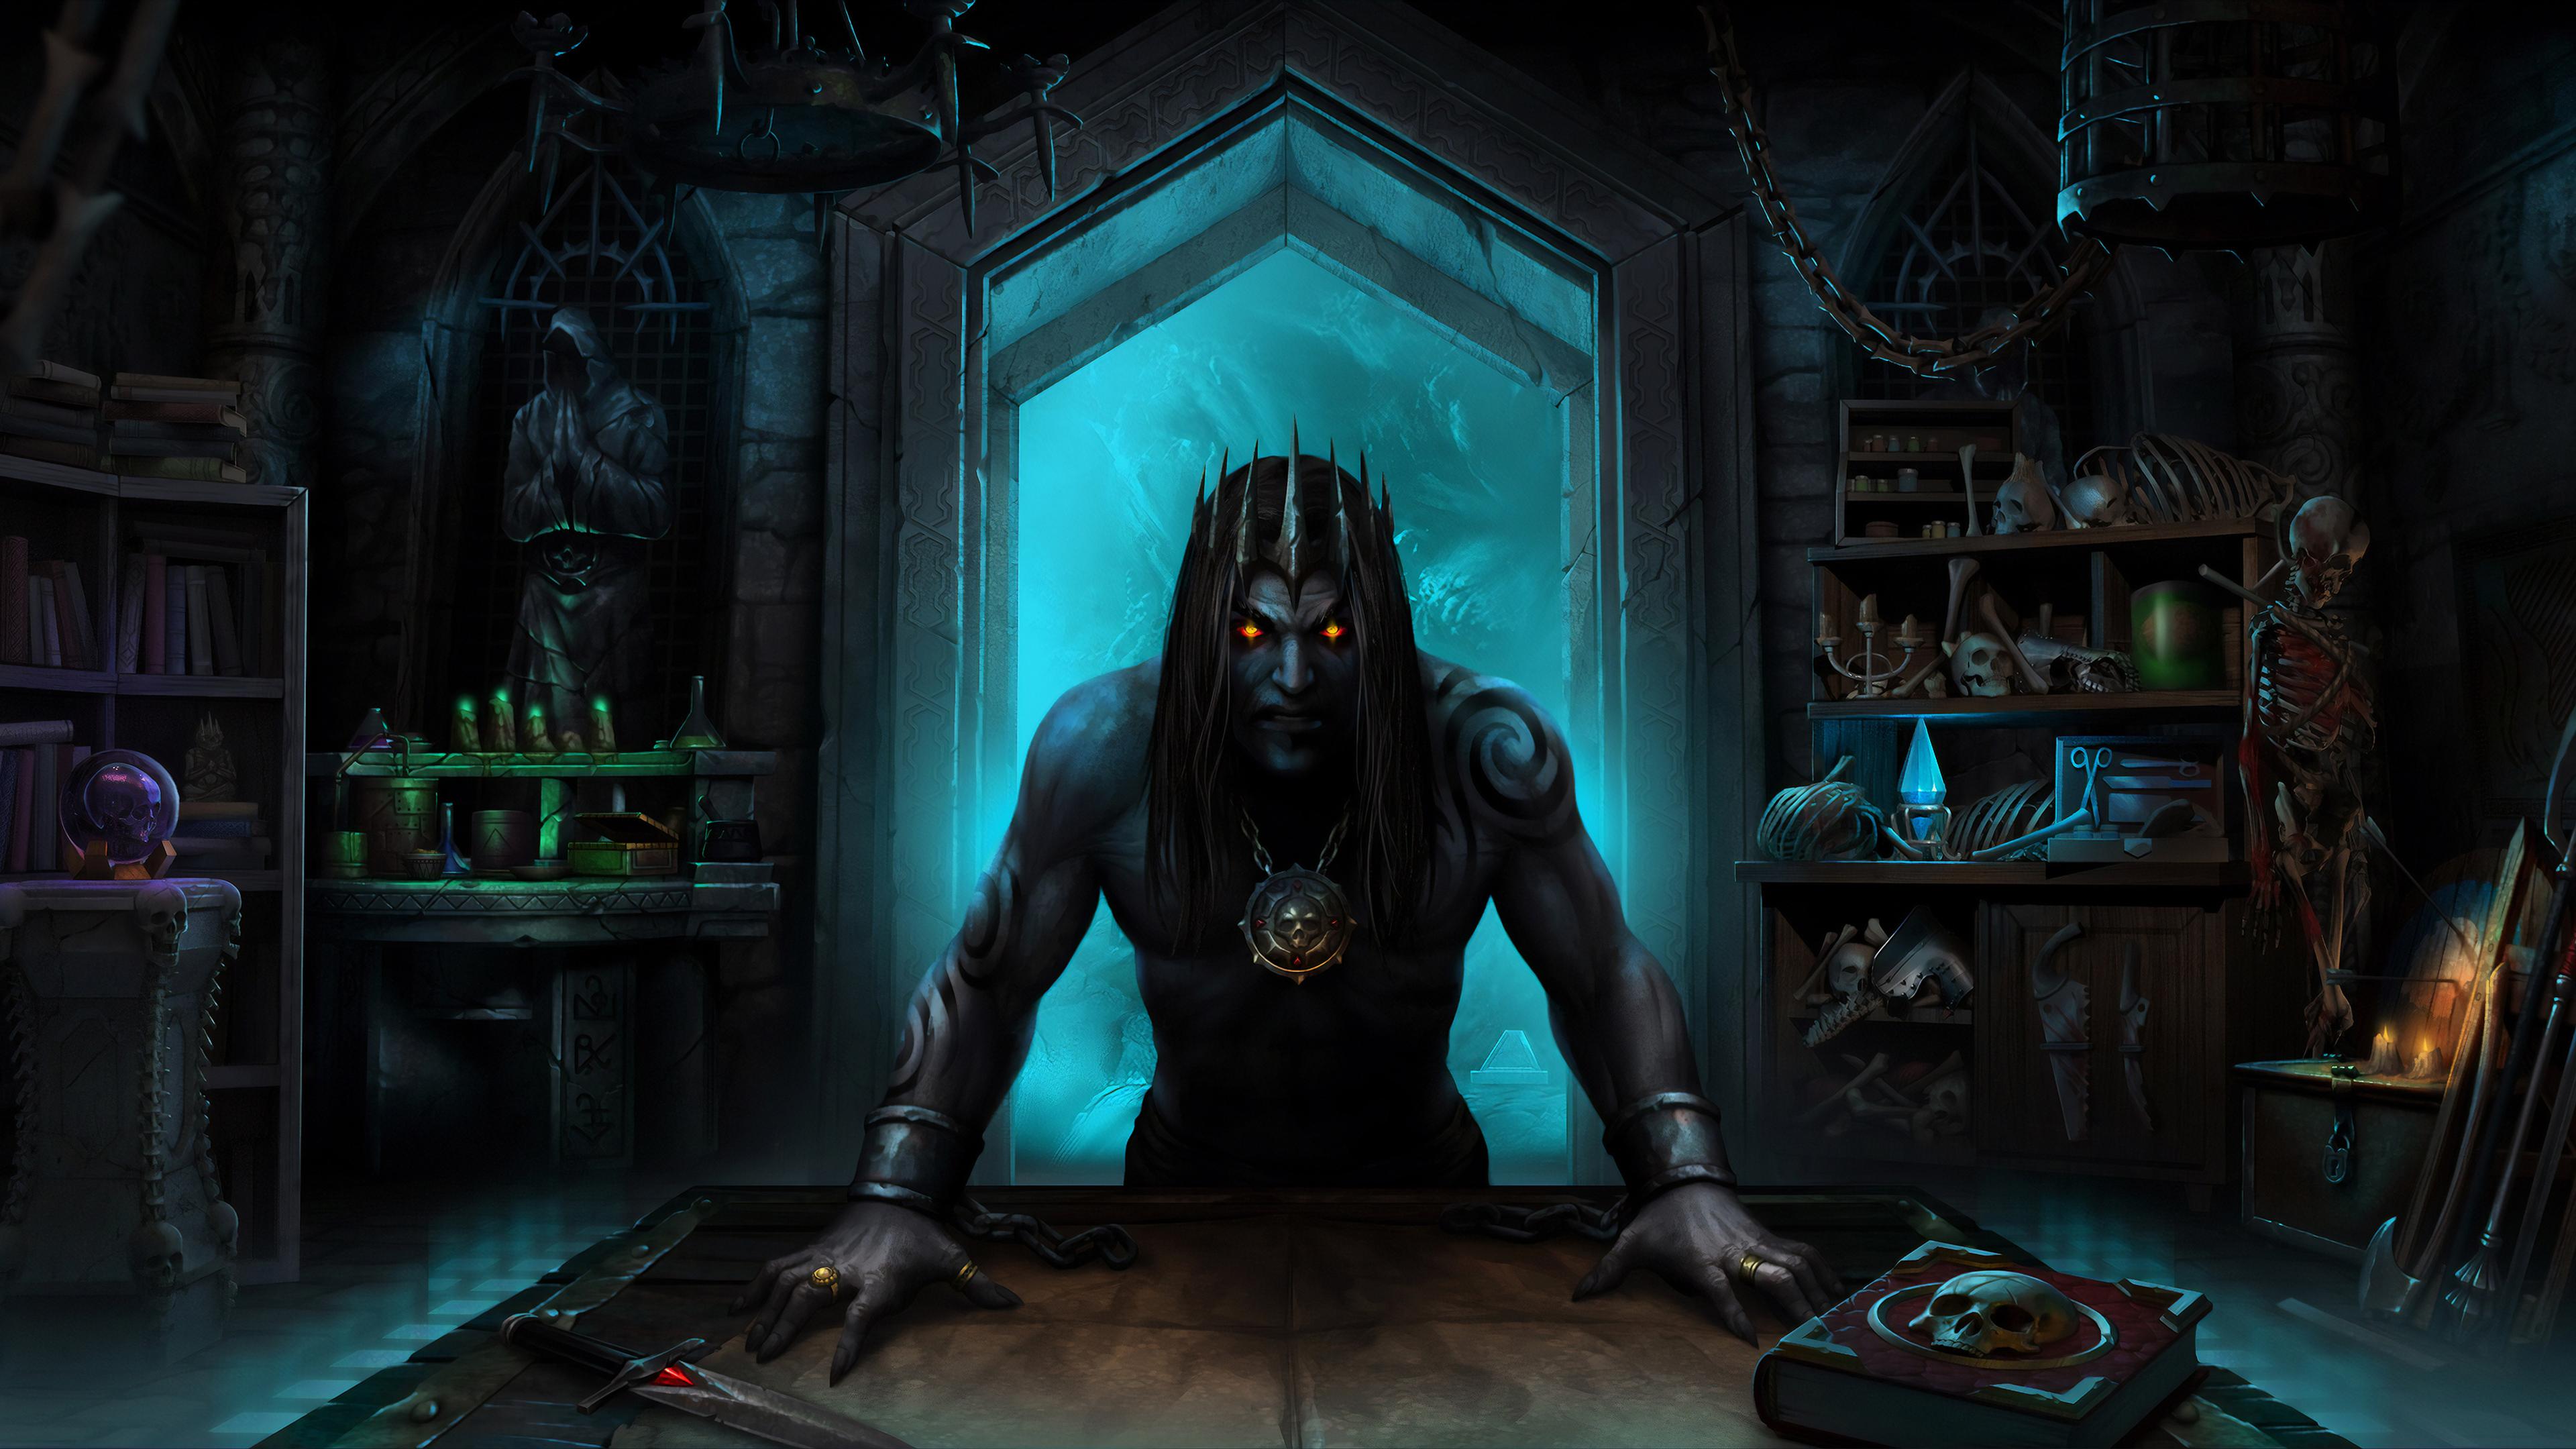 iratus lord of the dead 1565054354 - Iratus Lord Of The Dead - iratus lord of the dead wallpapers, hd-wallpapers, games wallpapers, 4k-wallpapers, 2019 games wallpapers